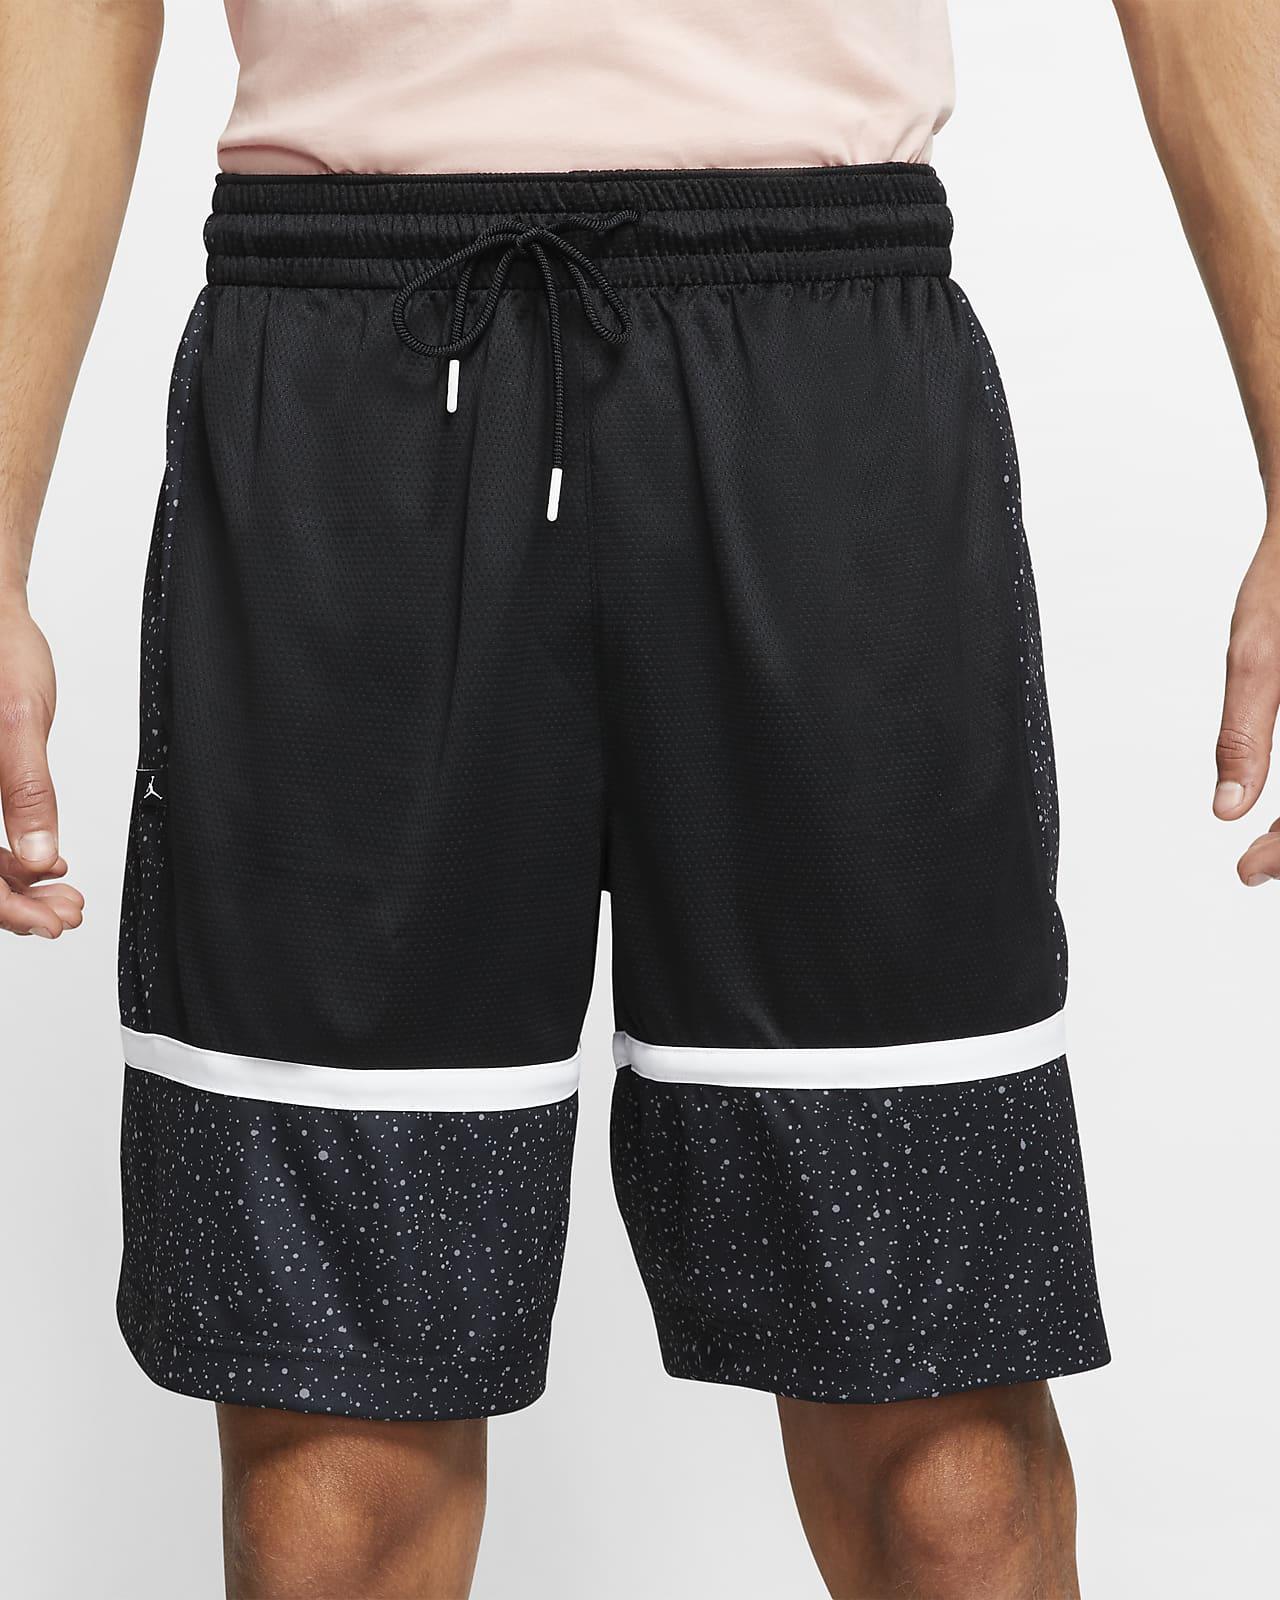 Jordan Jumpman Men's Graphic Basketball Shorts